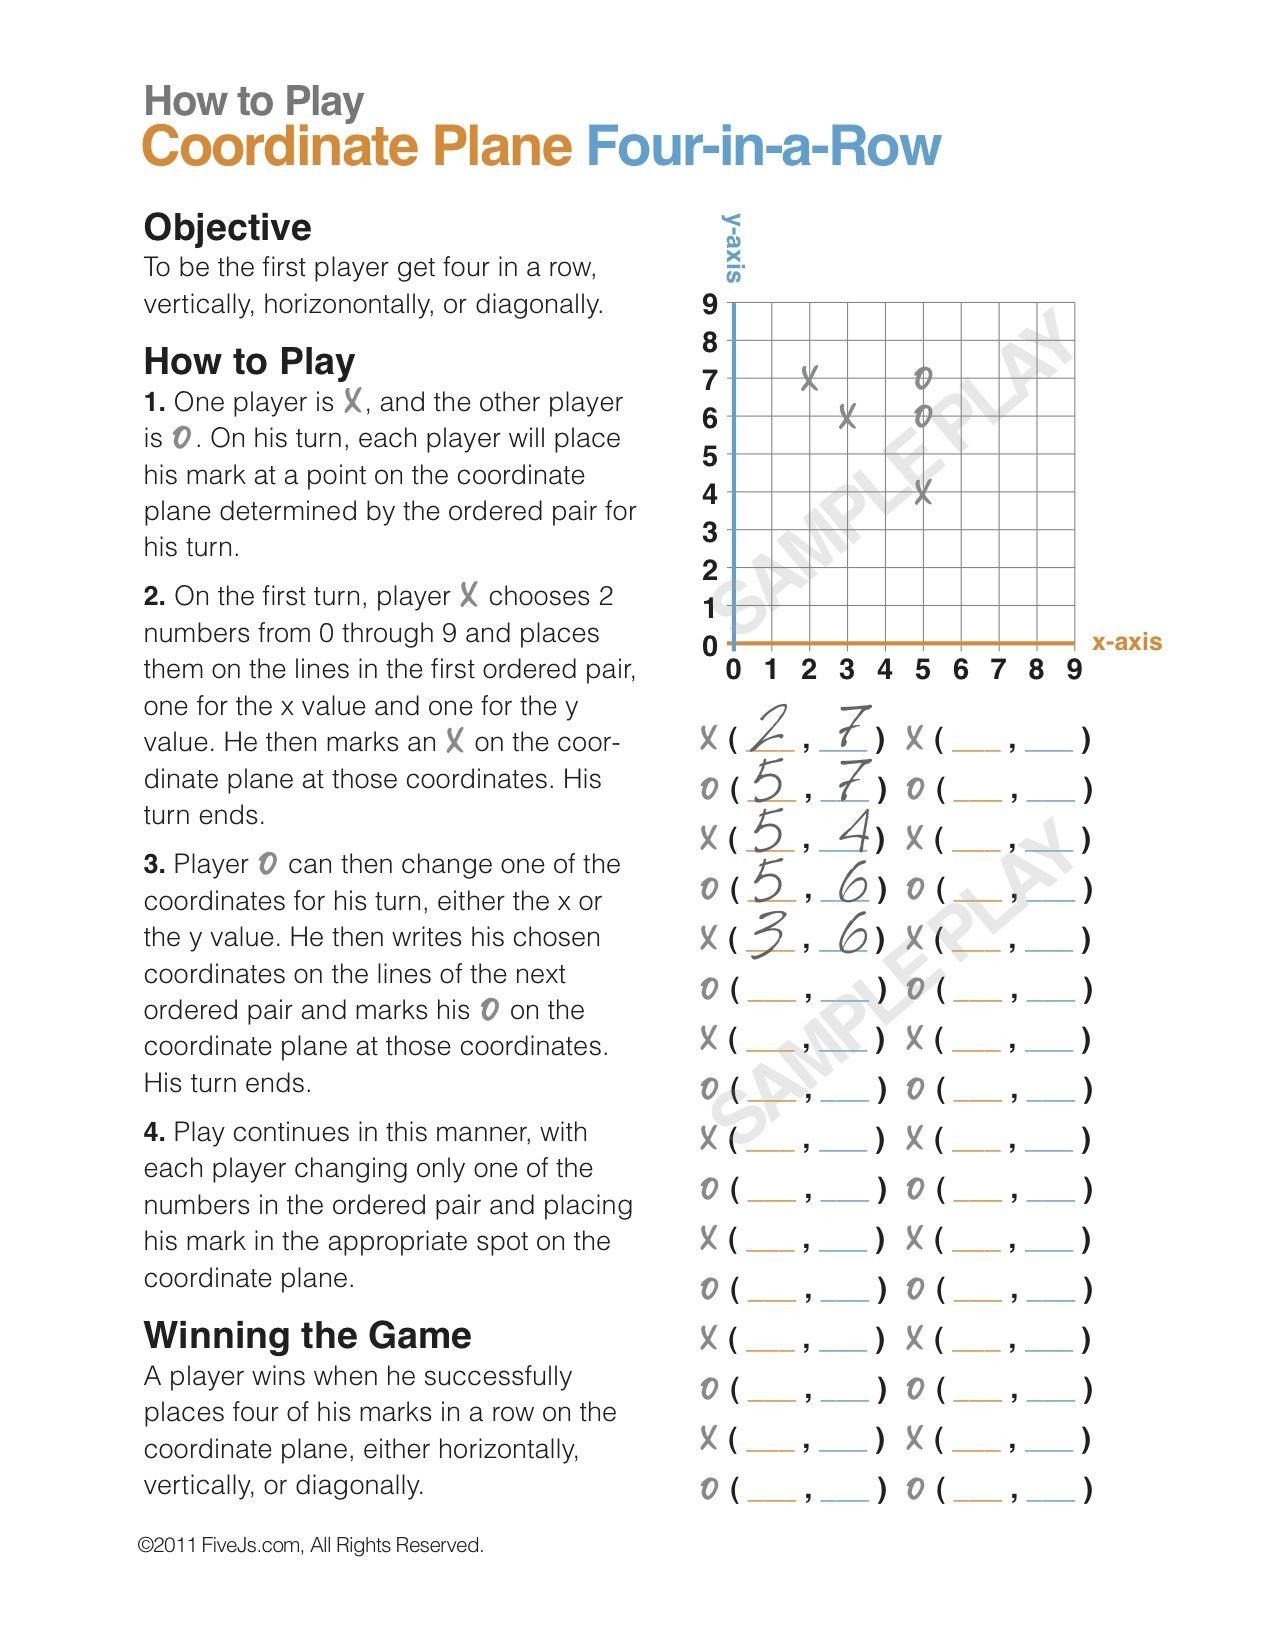 Coordinate Plane Math Game (Free download!) | Simple math, Game ...